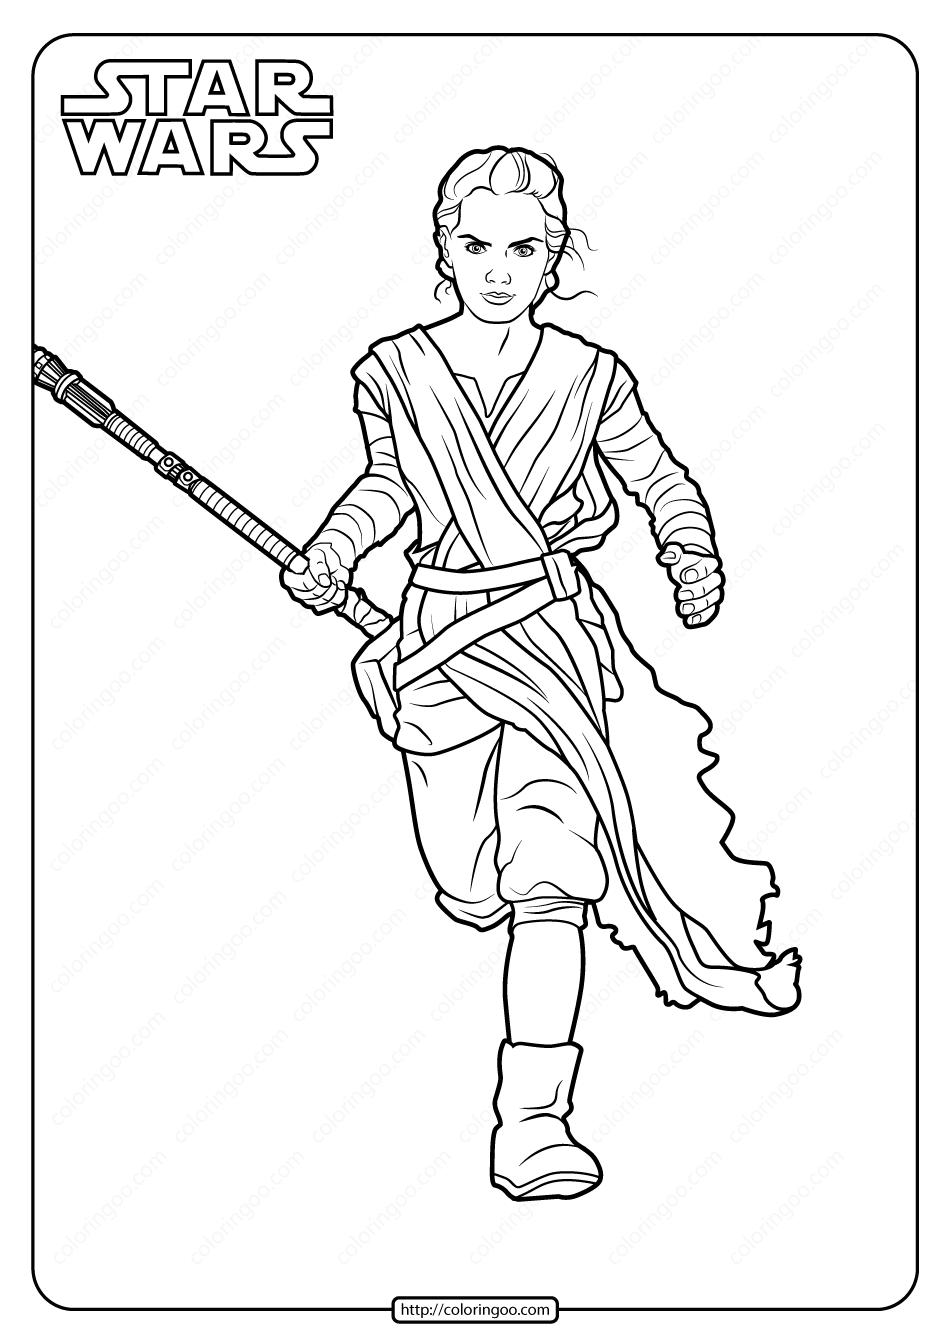 Star Wars Rey Printable Coloring Pages Book